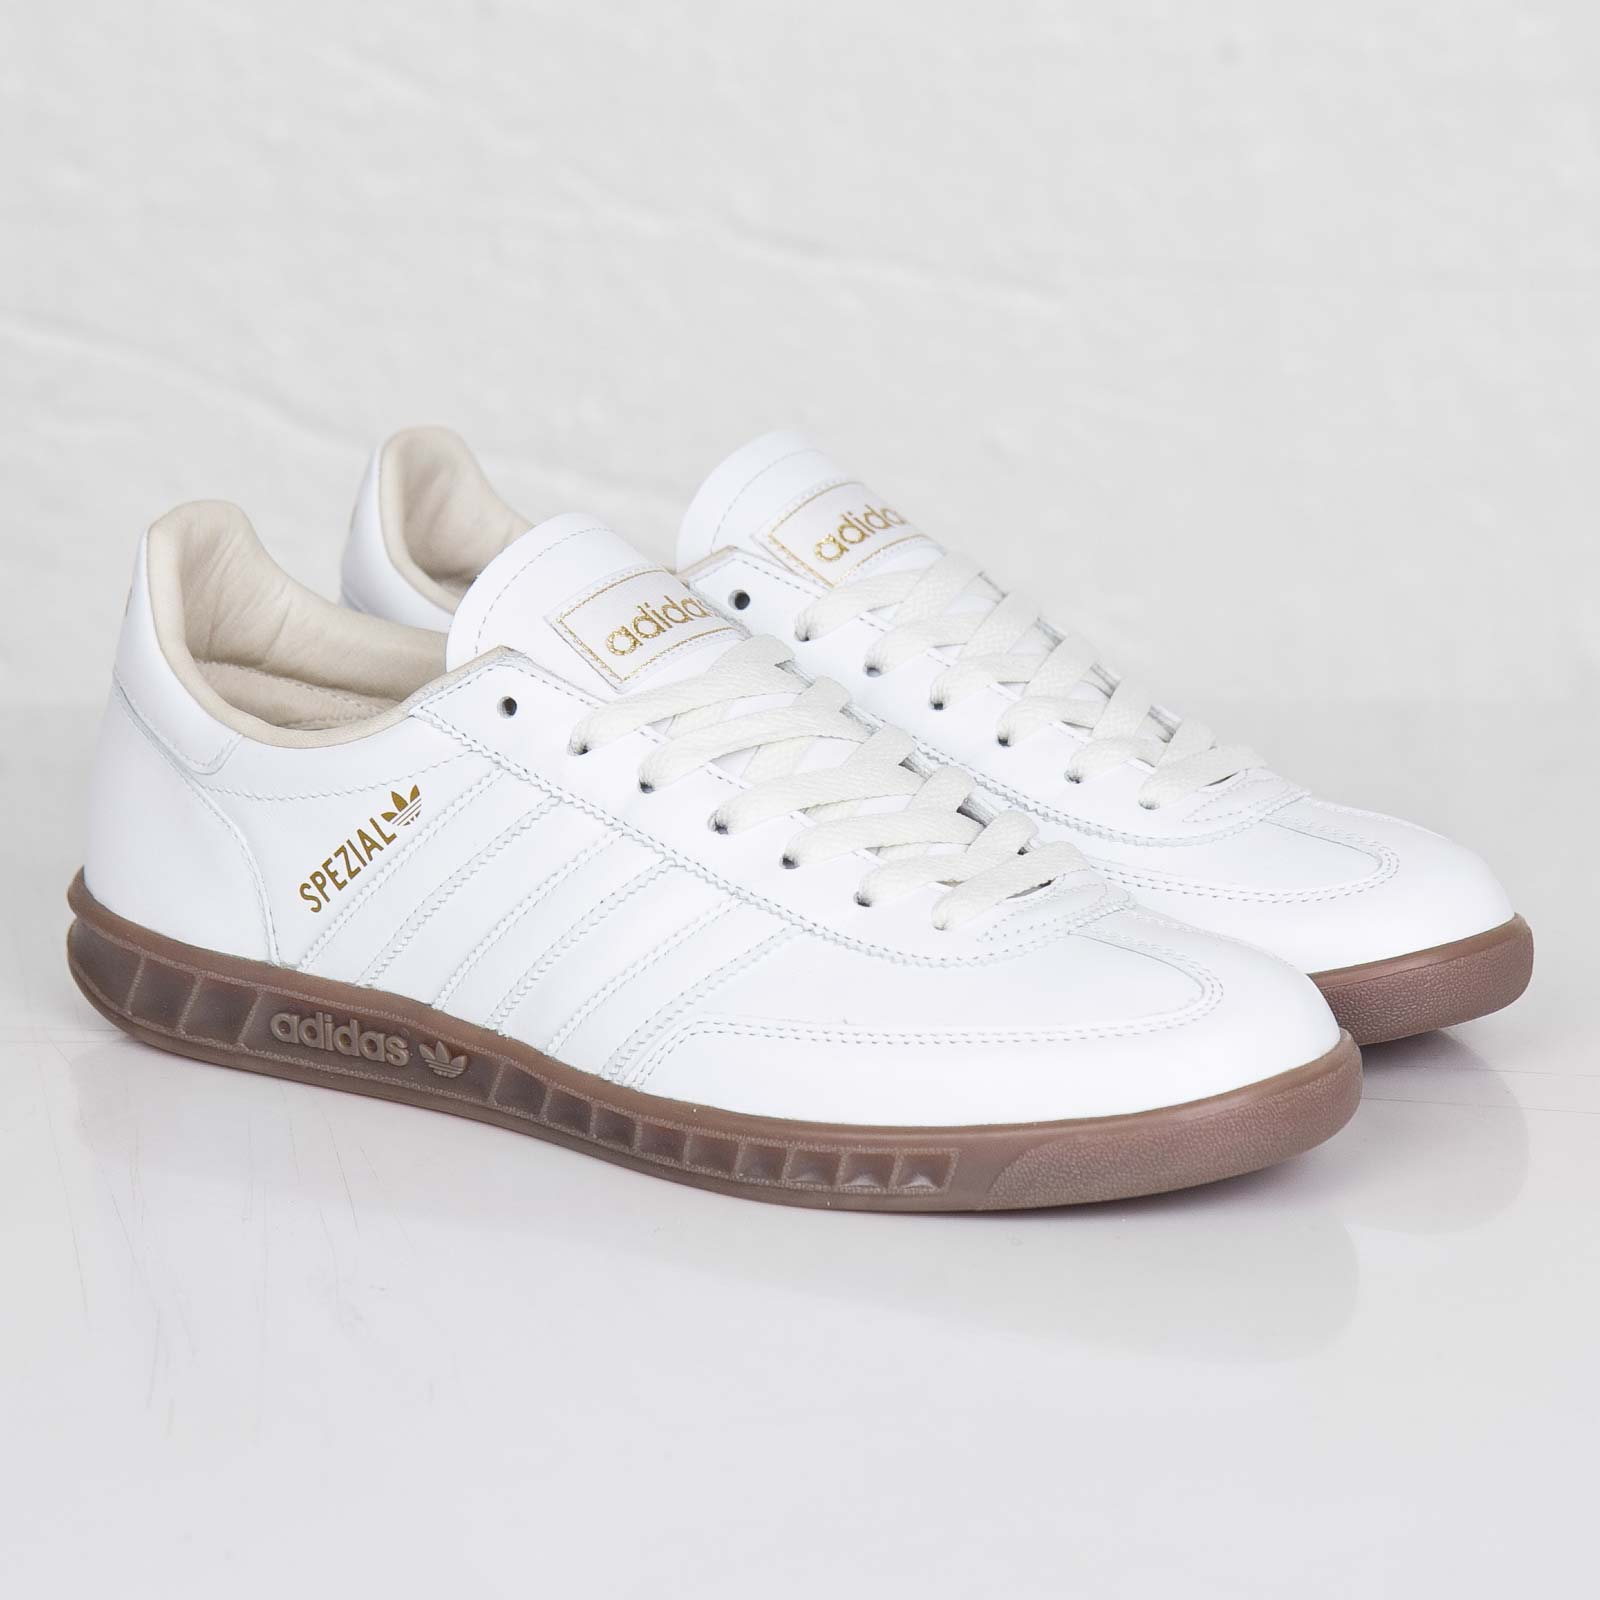 the best attitude 54d72 69acd adidas Hand-Burg Spezial - M21861 - Sneakersnstuff | sneakers ...